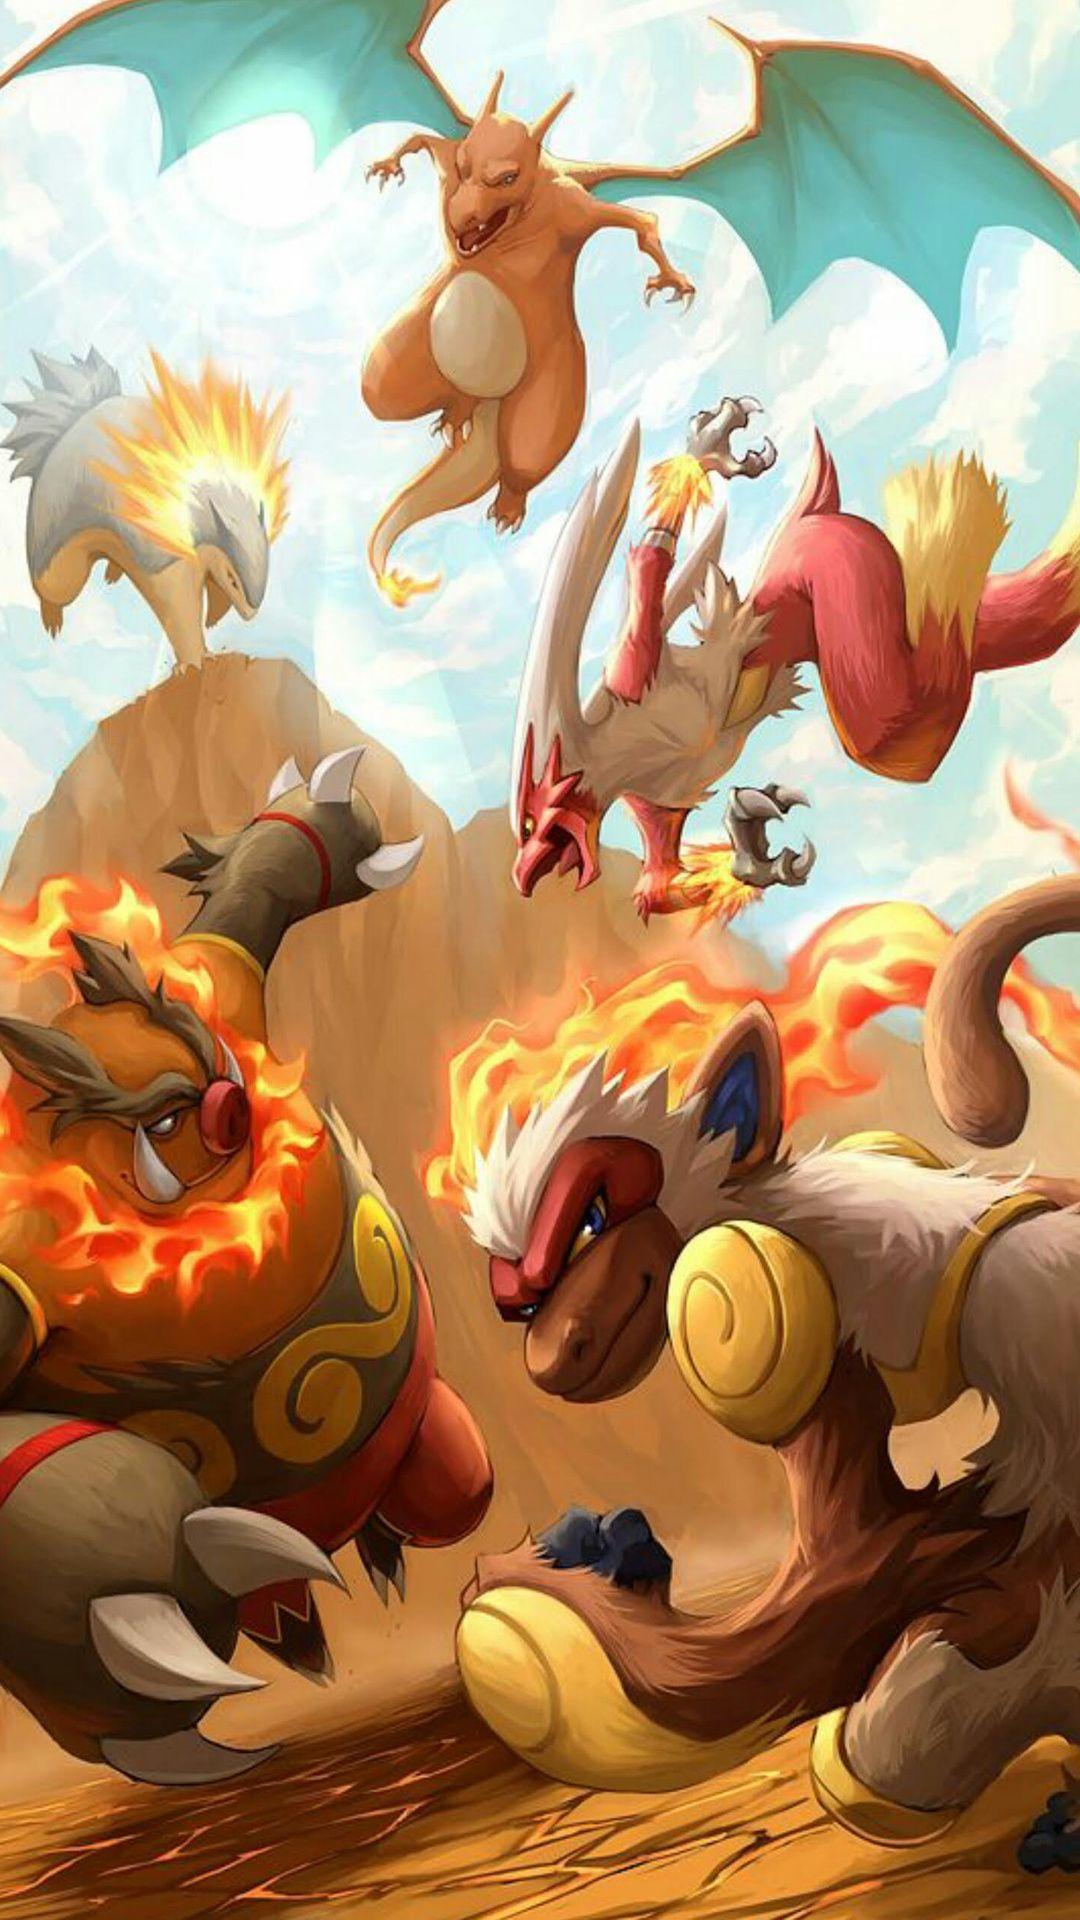 Pokemon Starters Wallpaper : pokemon, starters, wallpaper, Pokemon, Starters, Wallpaper